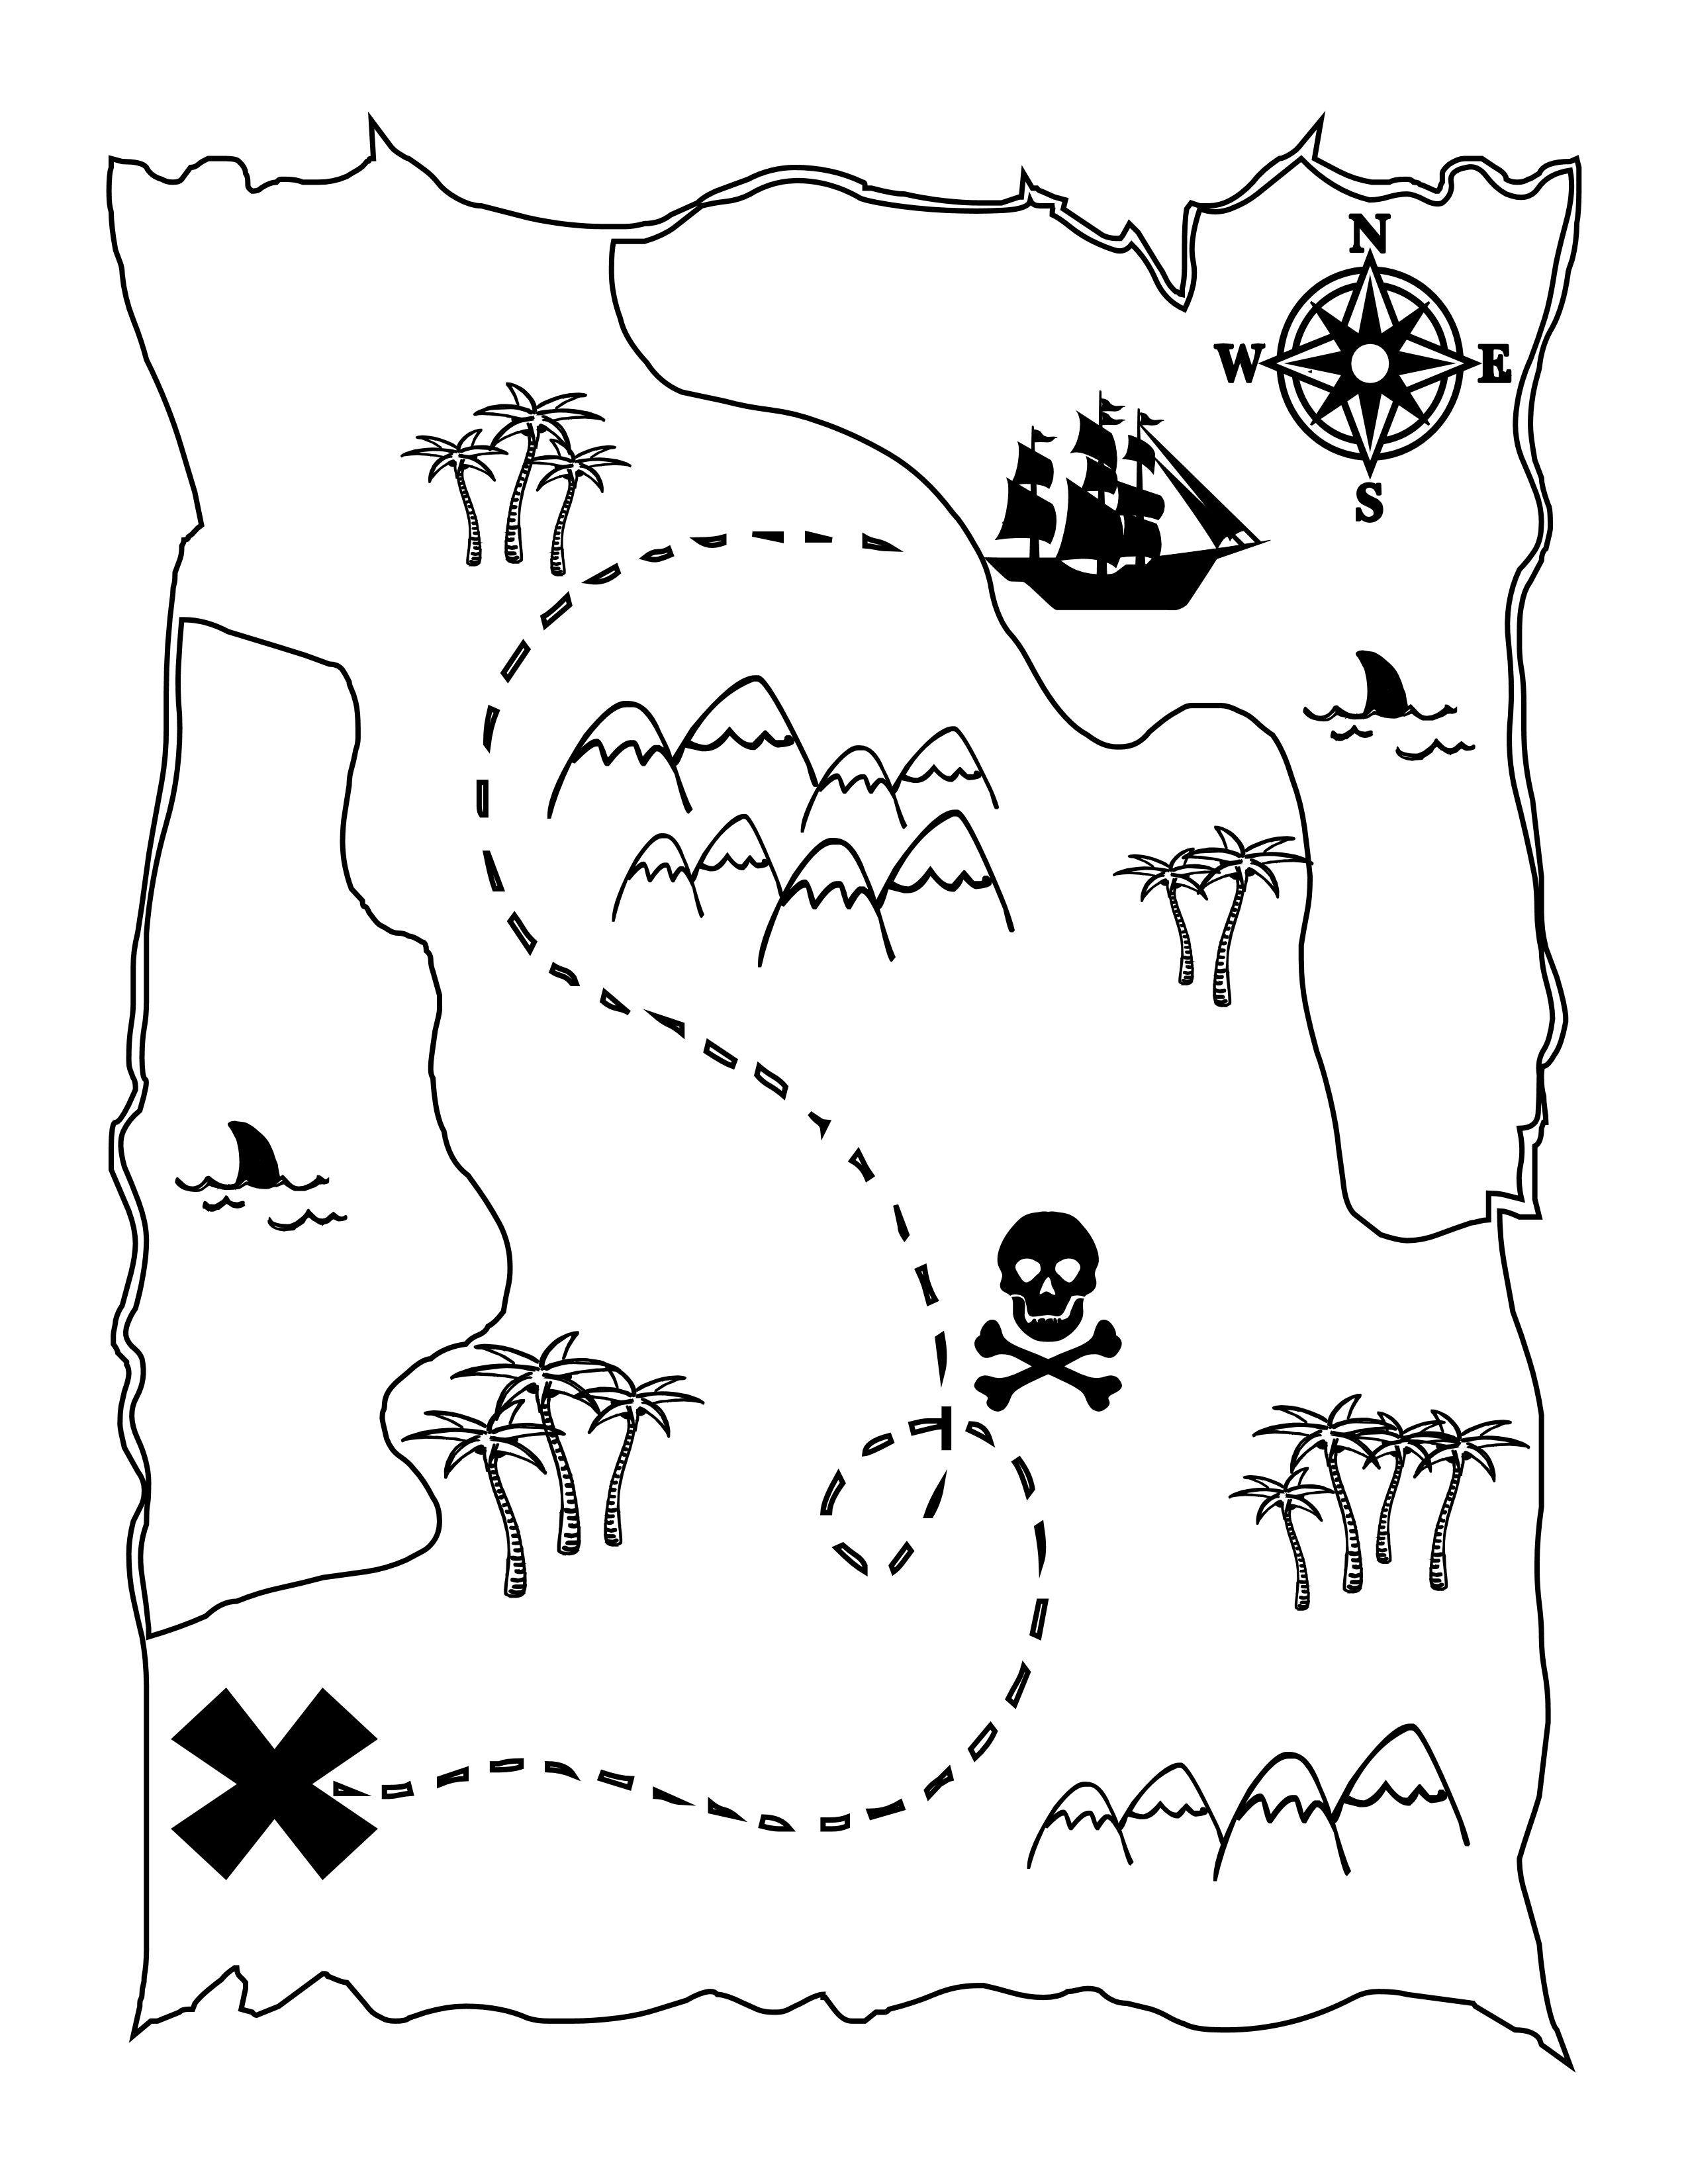 Printable Treasure Map Kids Activity Pirate Maps Pirate Treasure Maps Pirate Coloring Pages